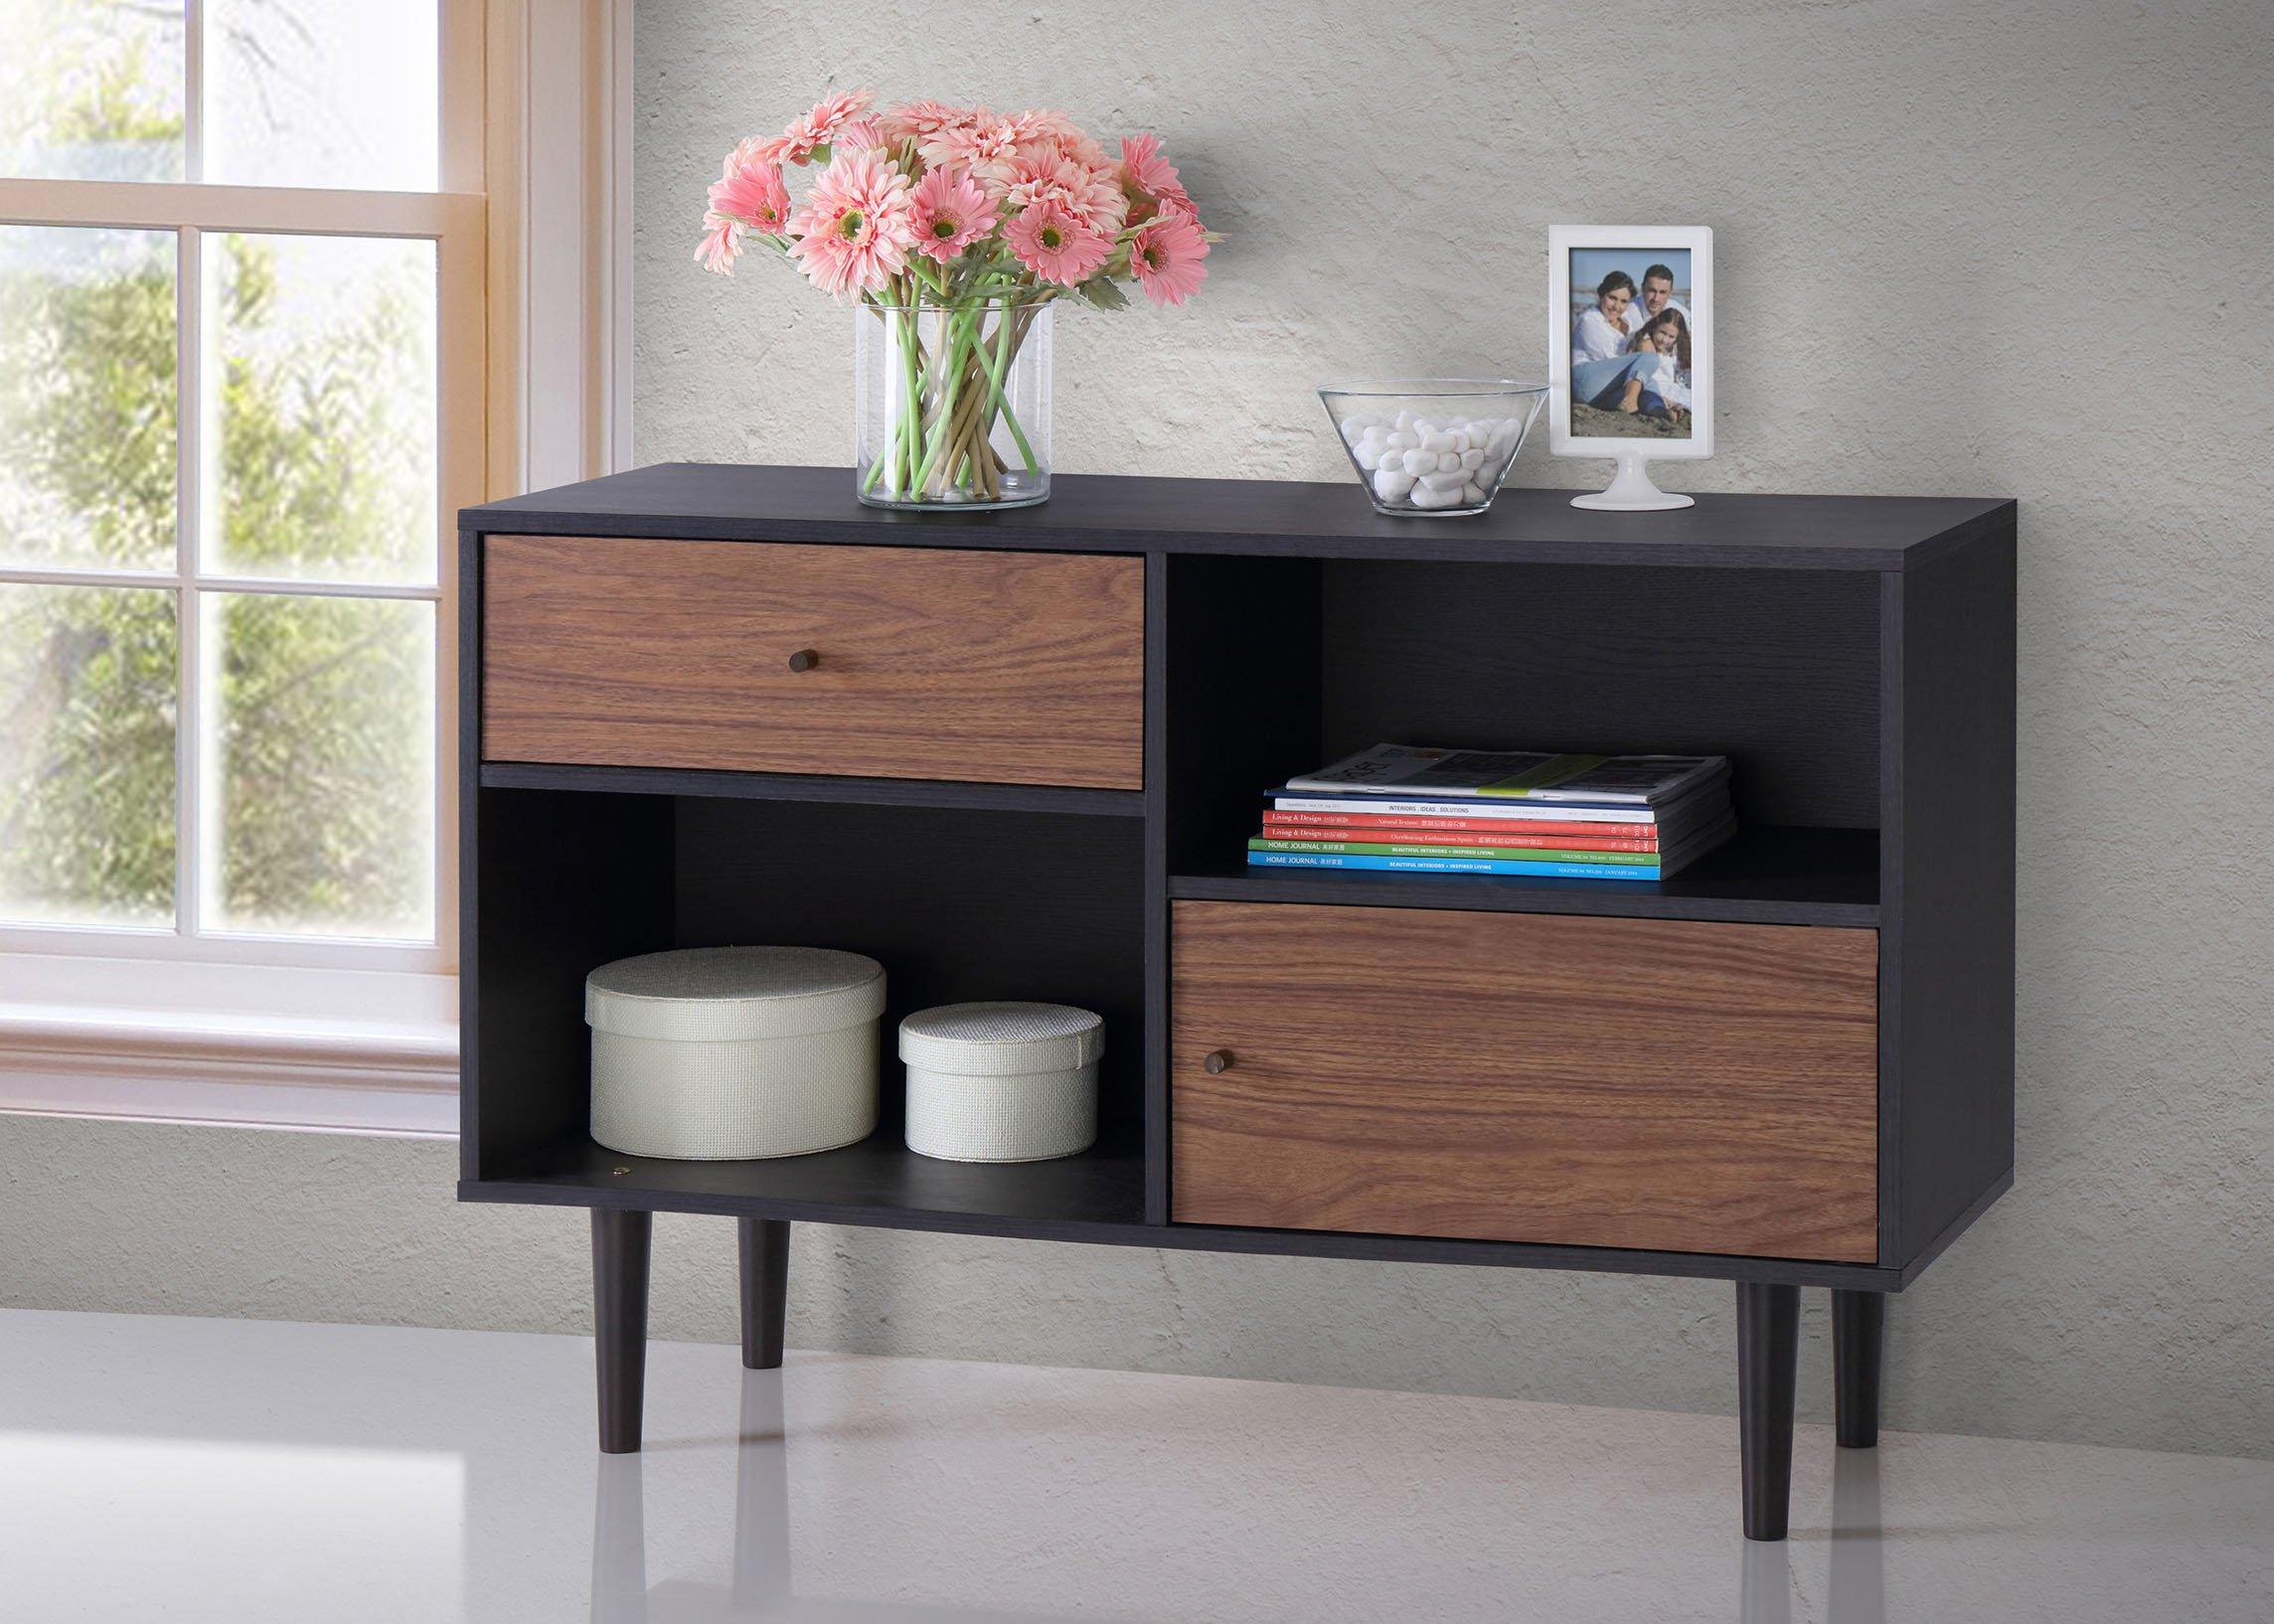 Baxton Furniture Studios Auburn Mid-Century Modern Scandinavian Style Sideboard Storage Cabinet by Baxton Studio